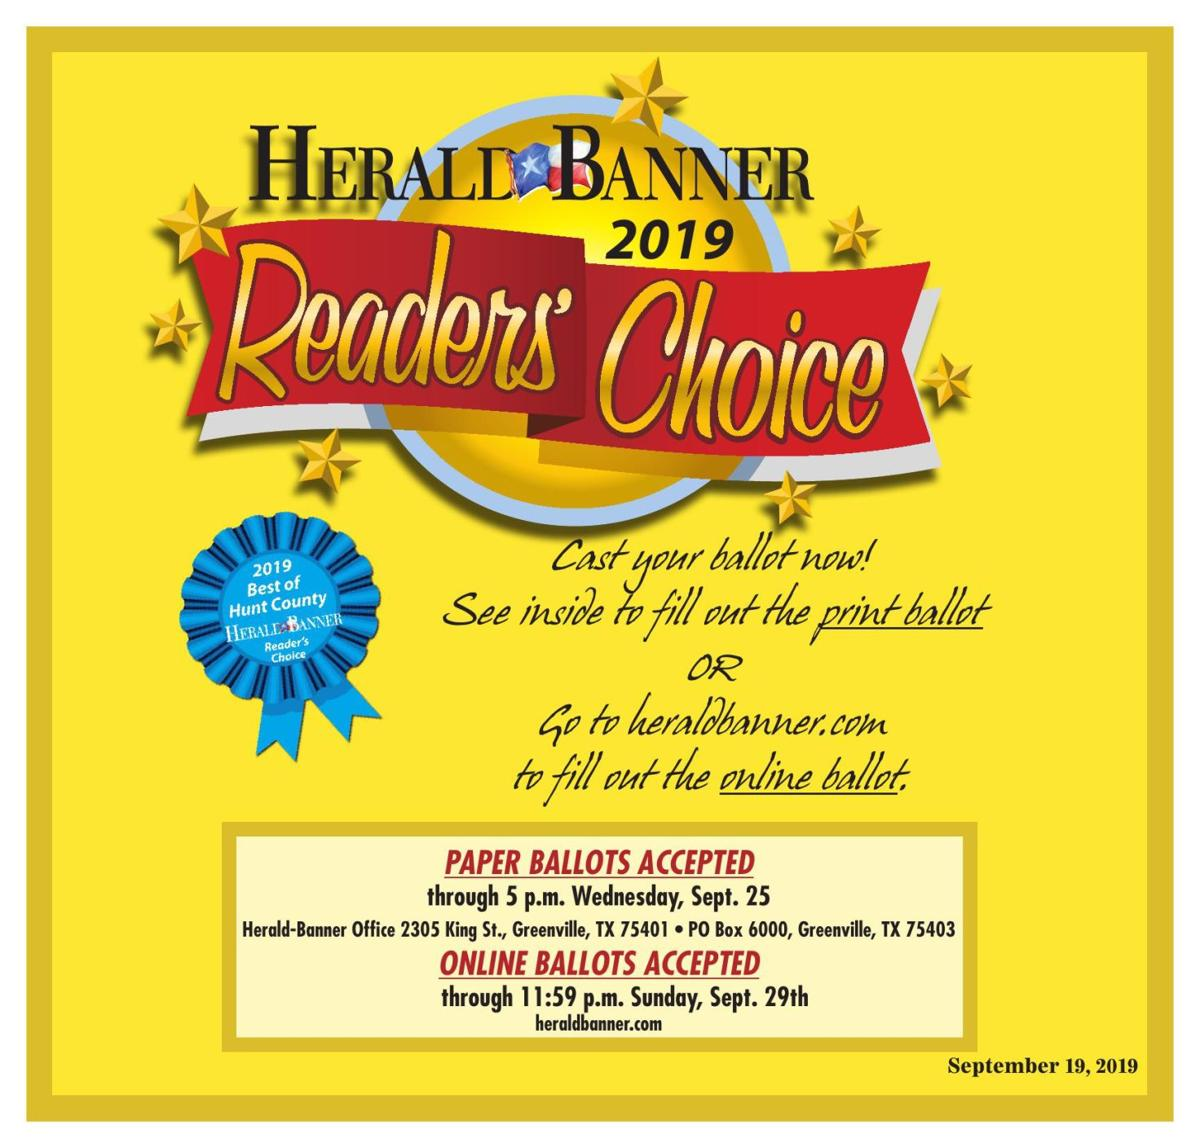 2019 HB Readers Choice Ballot Tab